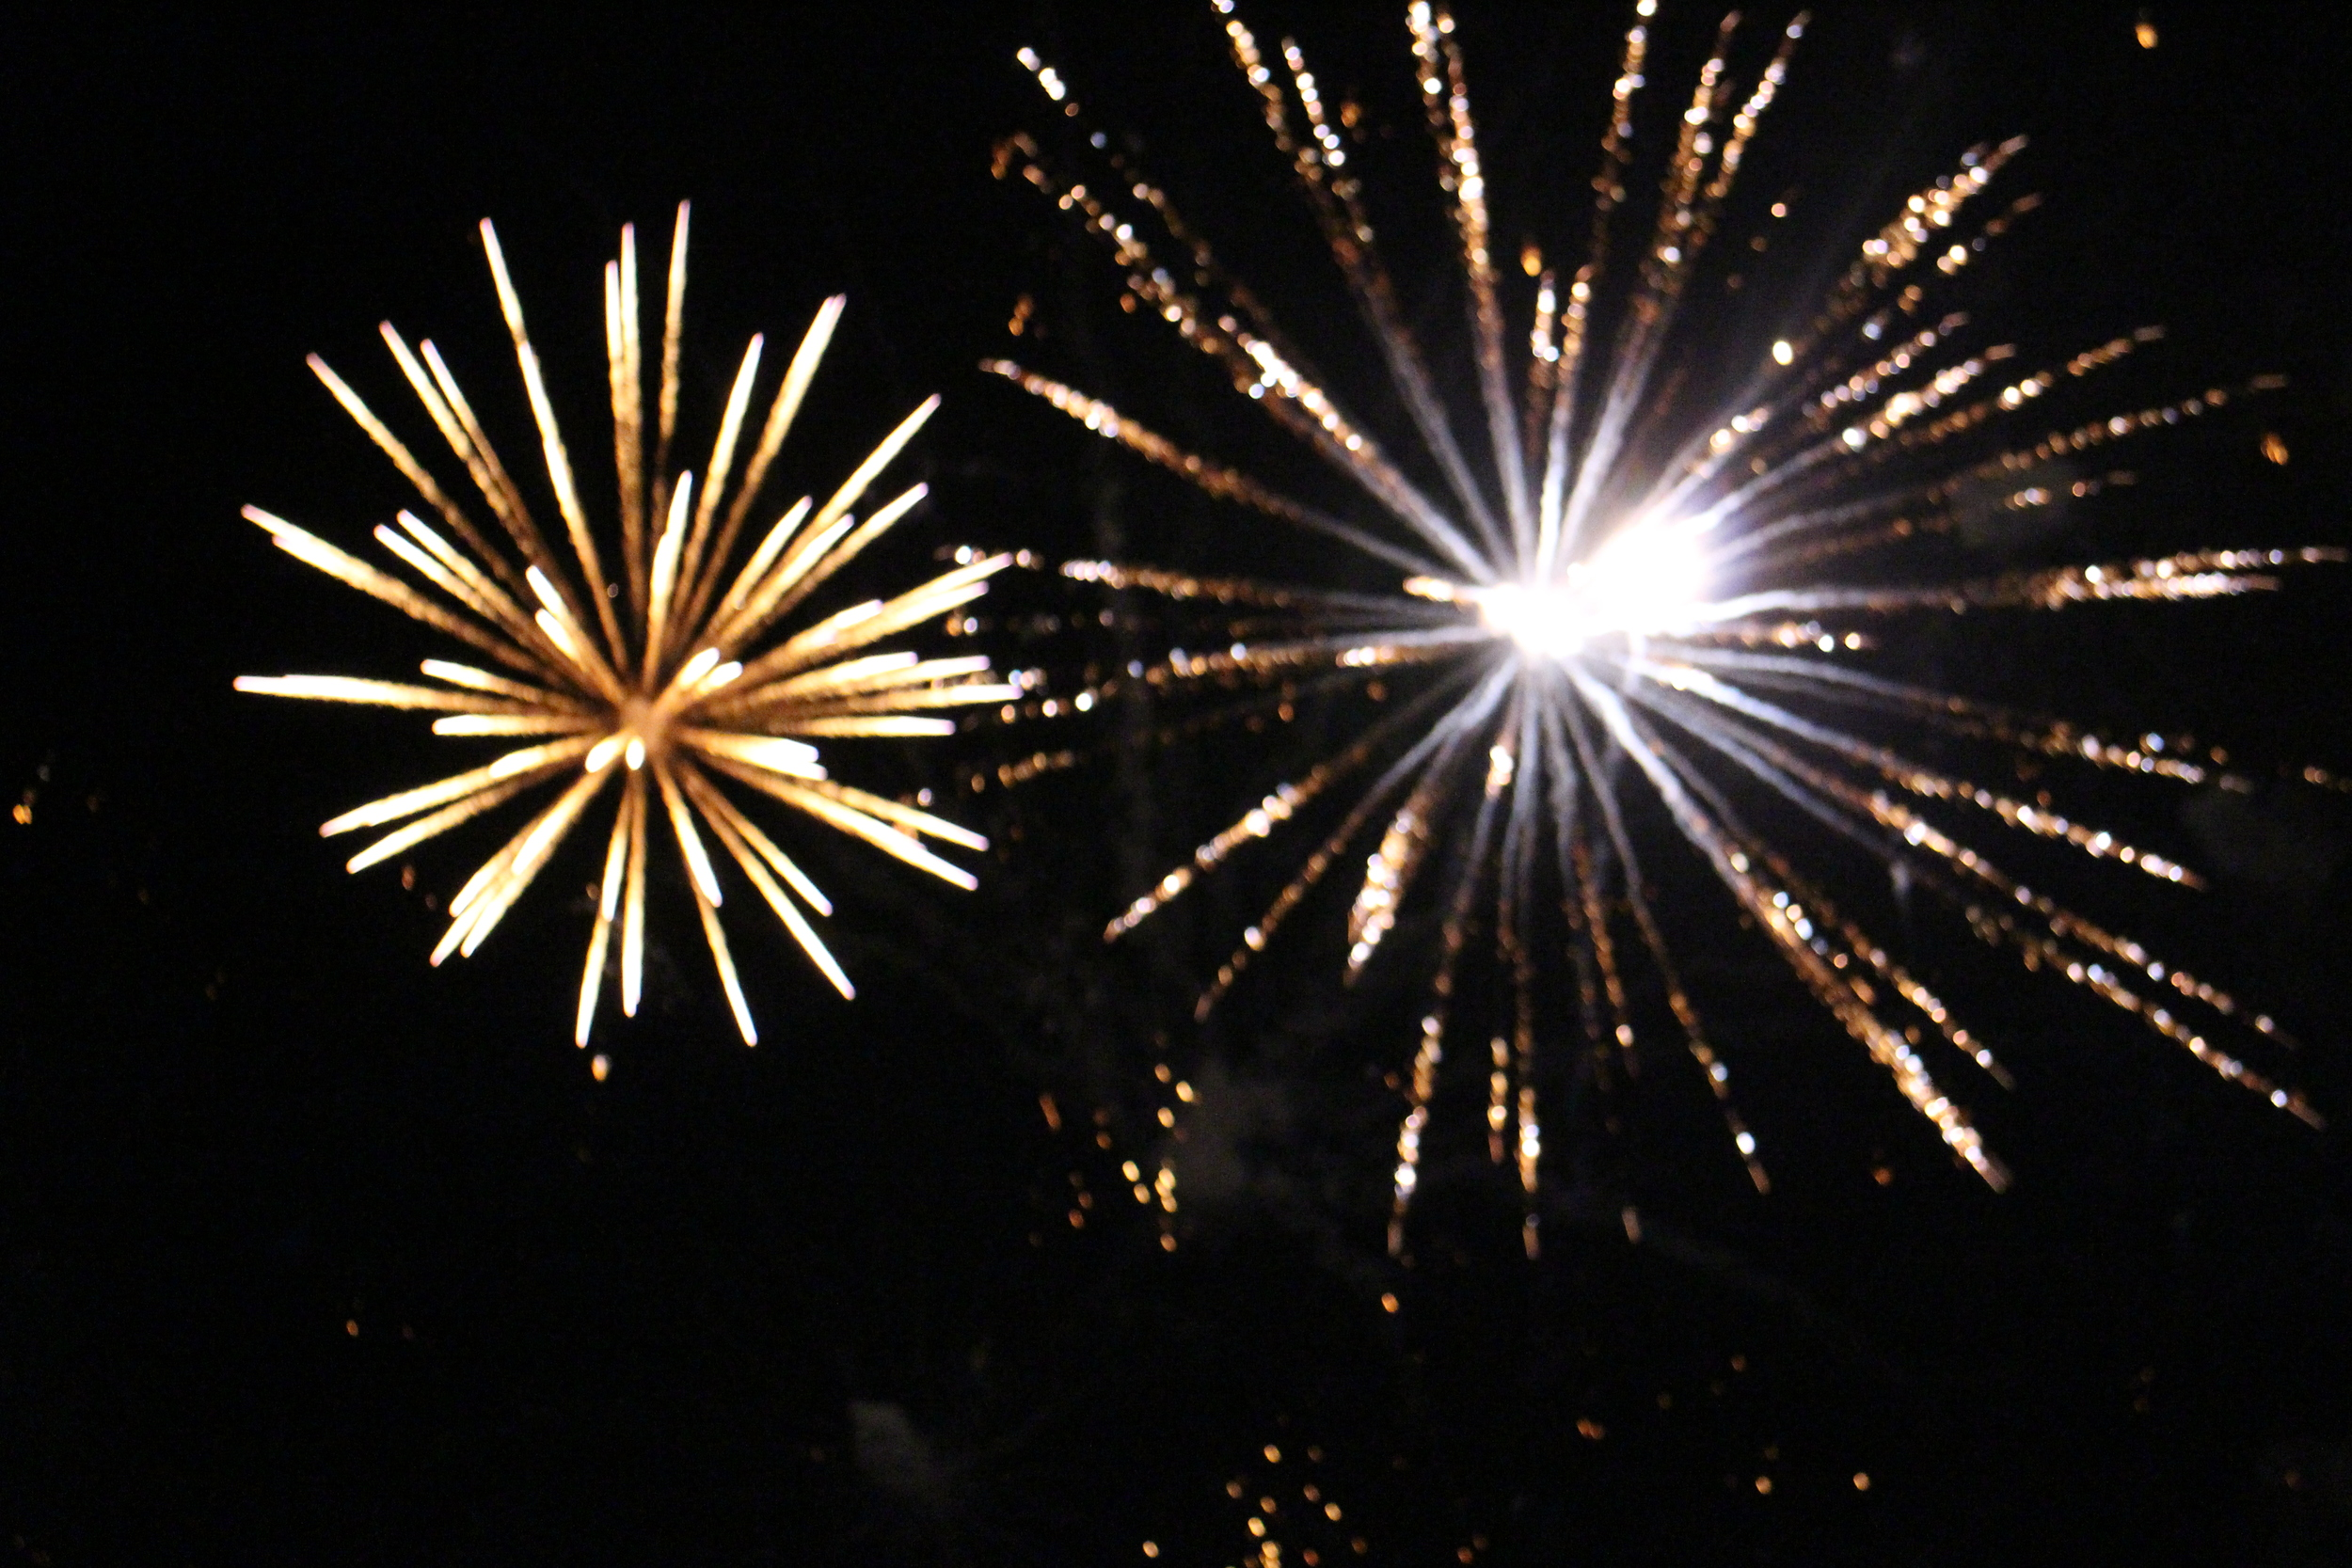 NOVEMBER: 'Light up Lancaster' Fireworks at the Castle